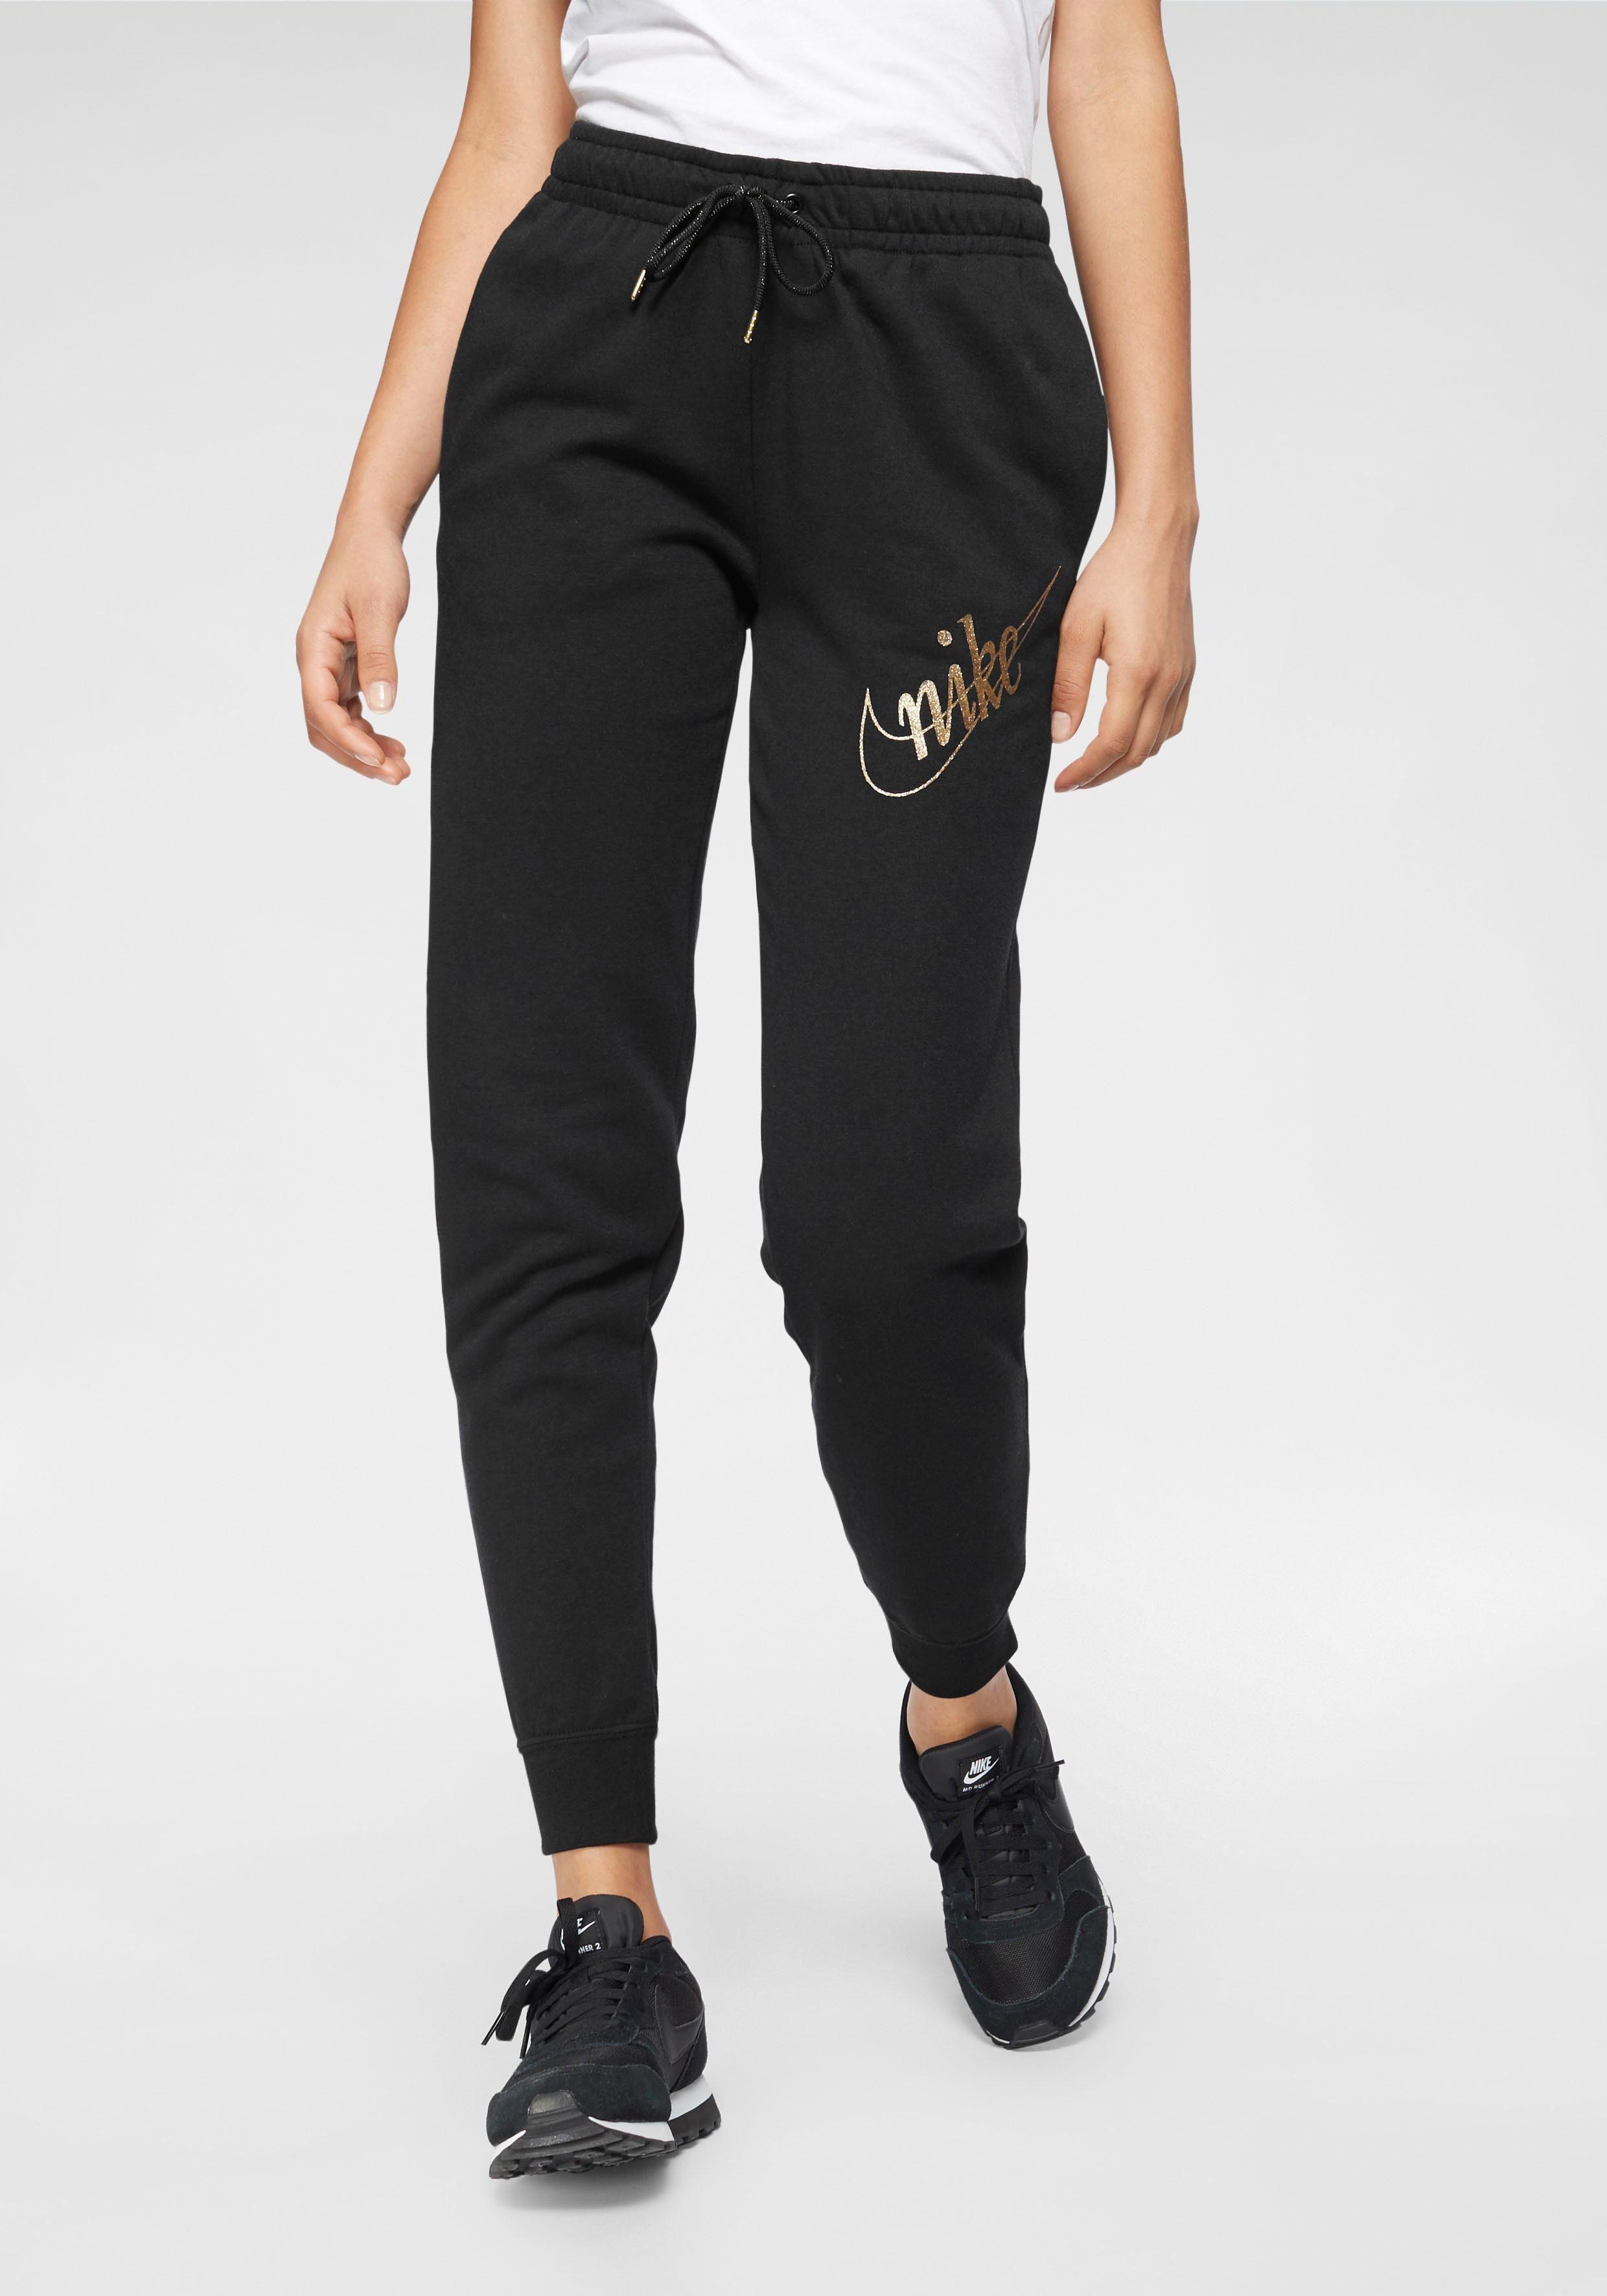 Nike Sportswear Jogginghose »W Nsw Pant Flc Glitter« Goldfarbener Glitzerdruck online kaufen | OTTO